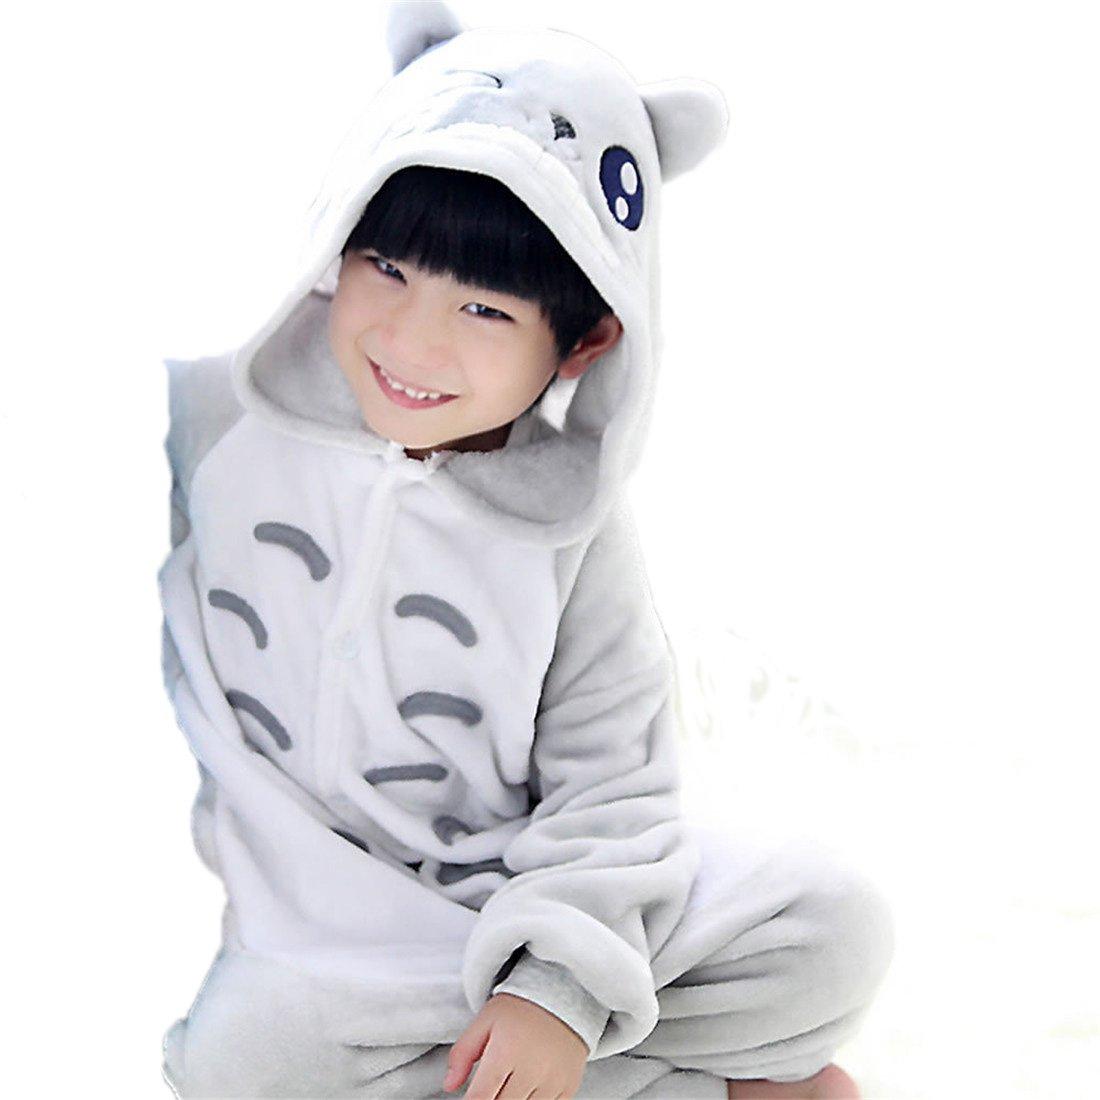 Silver Moonlight Halloween Pajamas Homewear Onepiece Onesie Cosplay Costumes Kigurumi Animal Outfit Loungewear (S, Totoro)